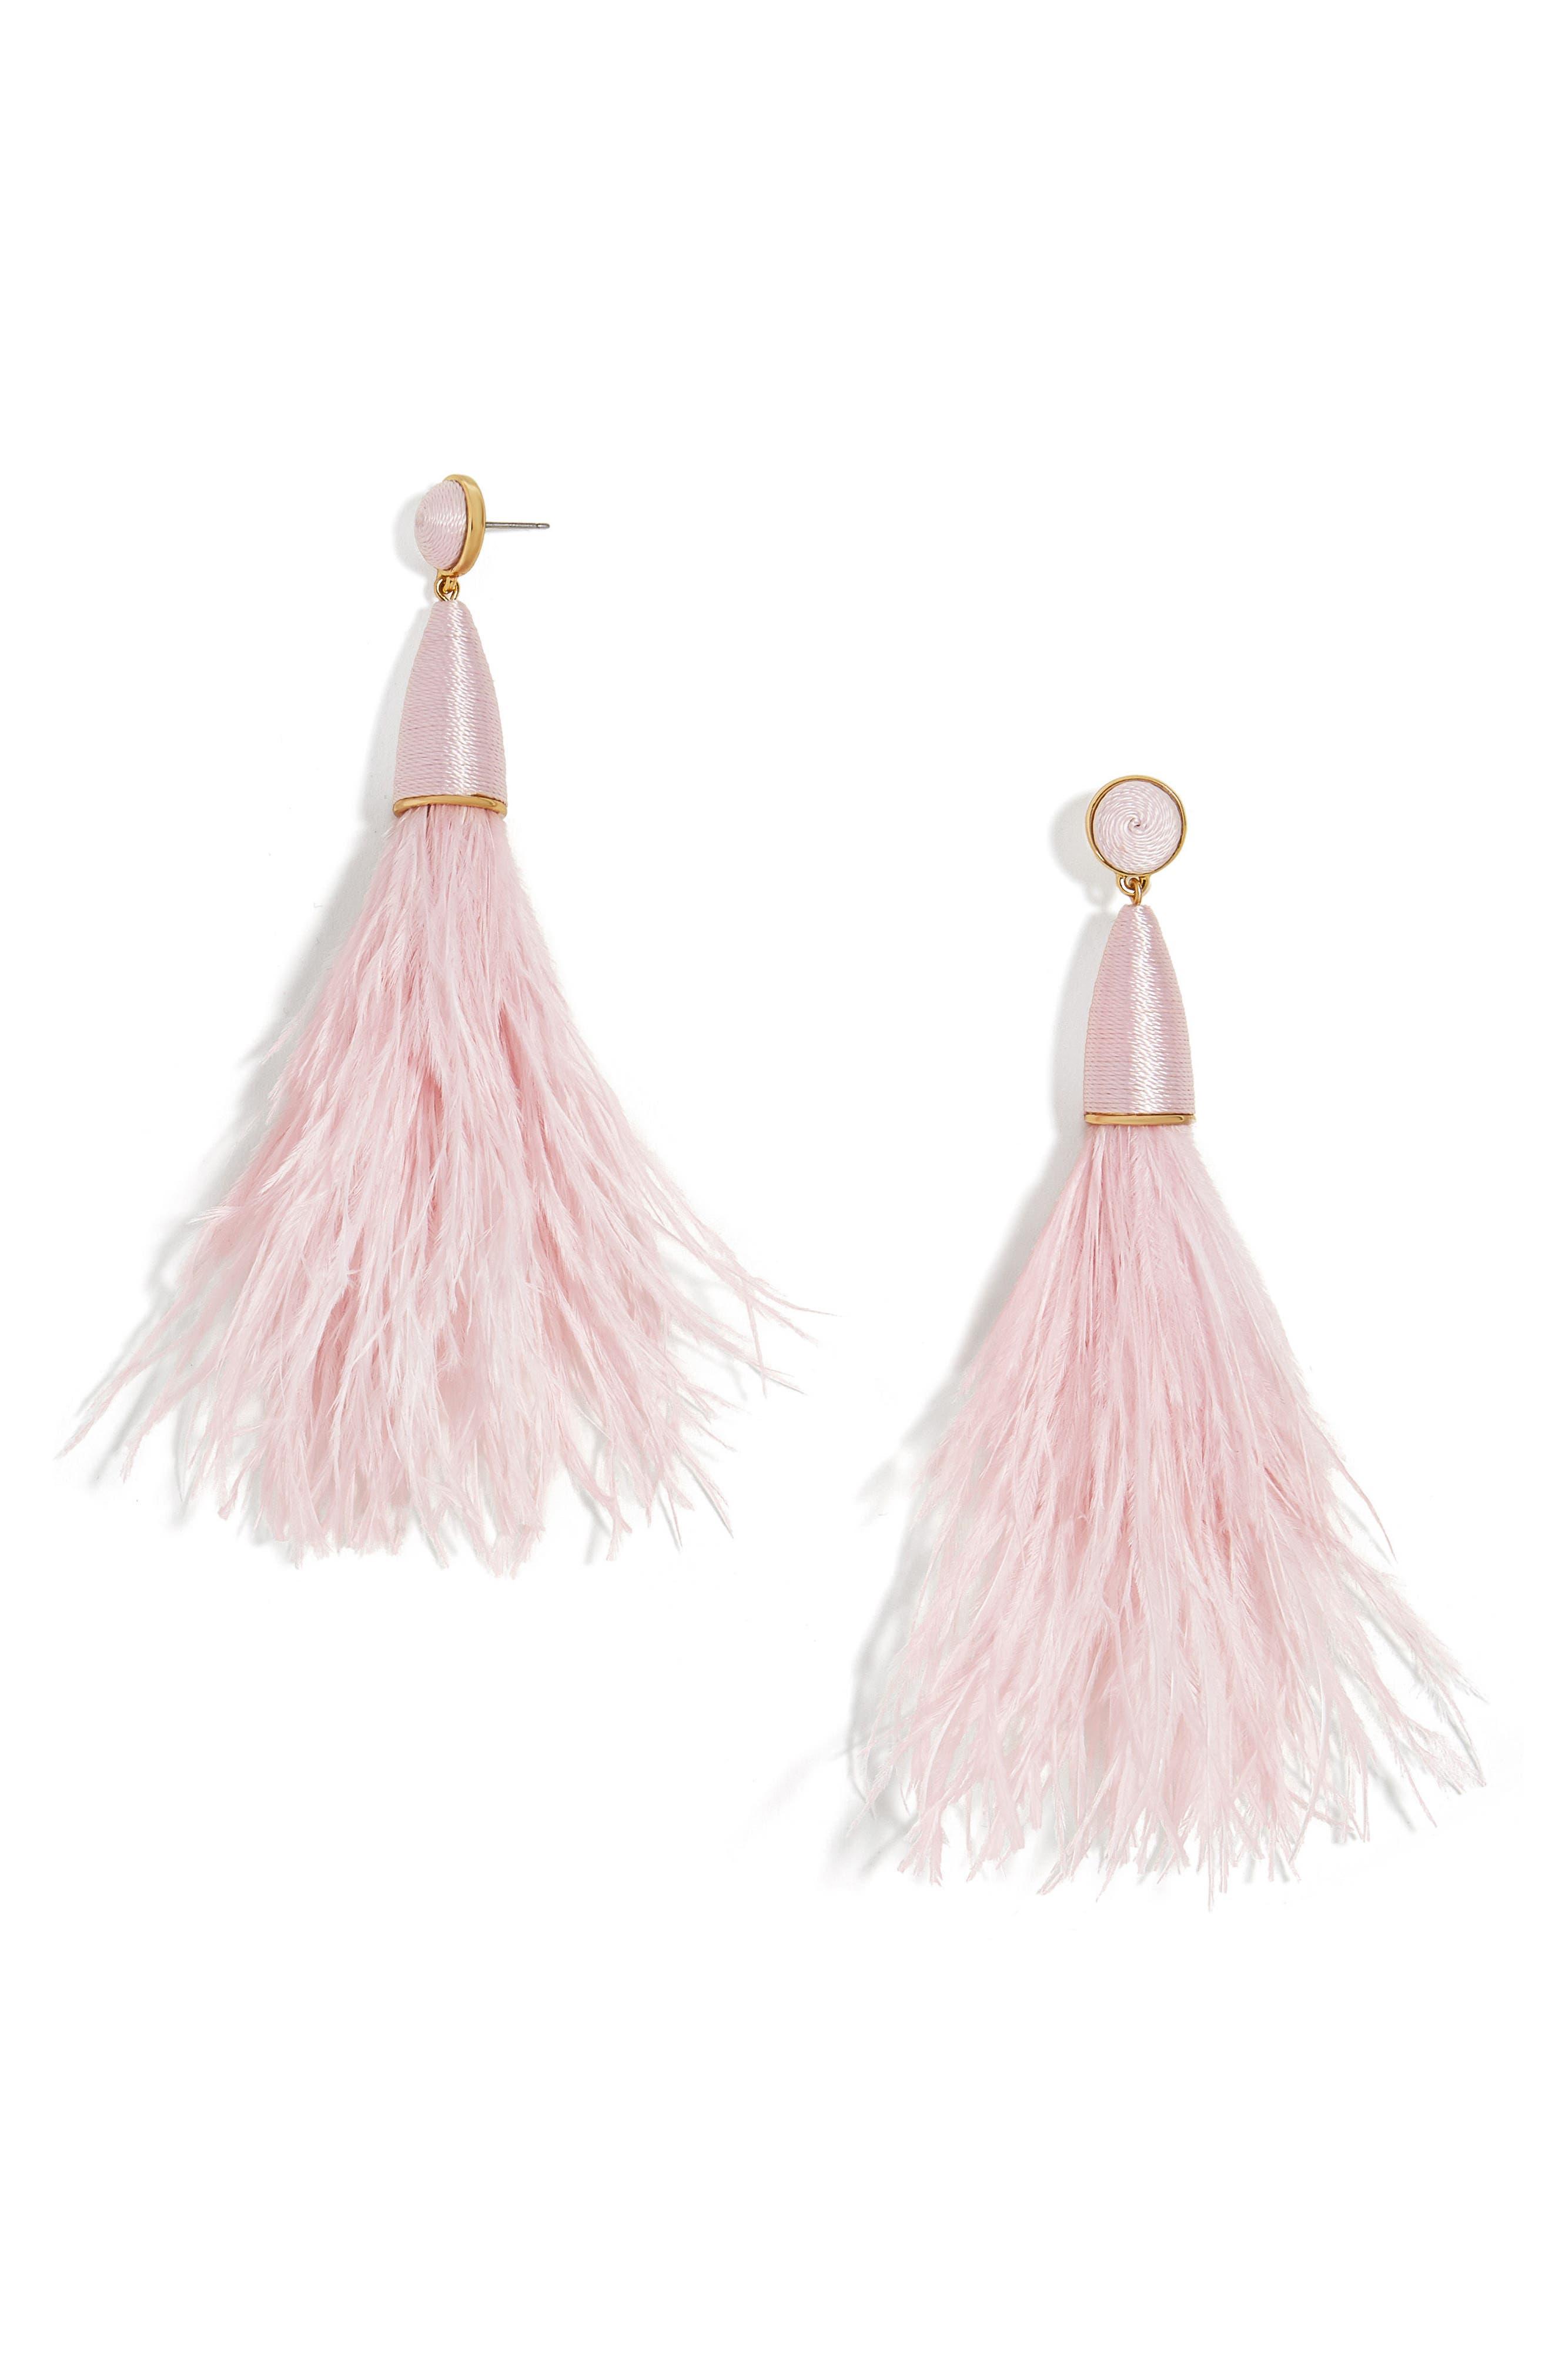 Main Image - BaubleBar Chateau Feather Tassel Earrings